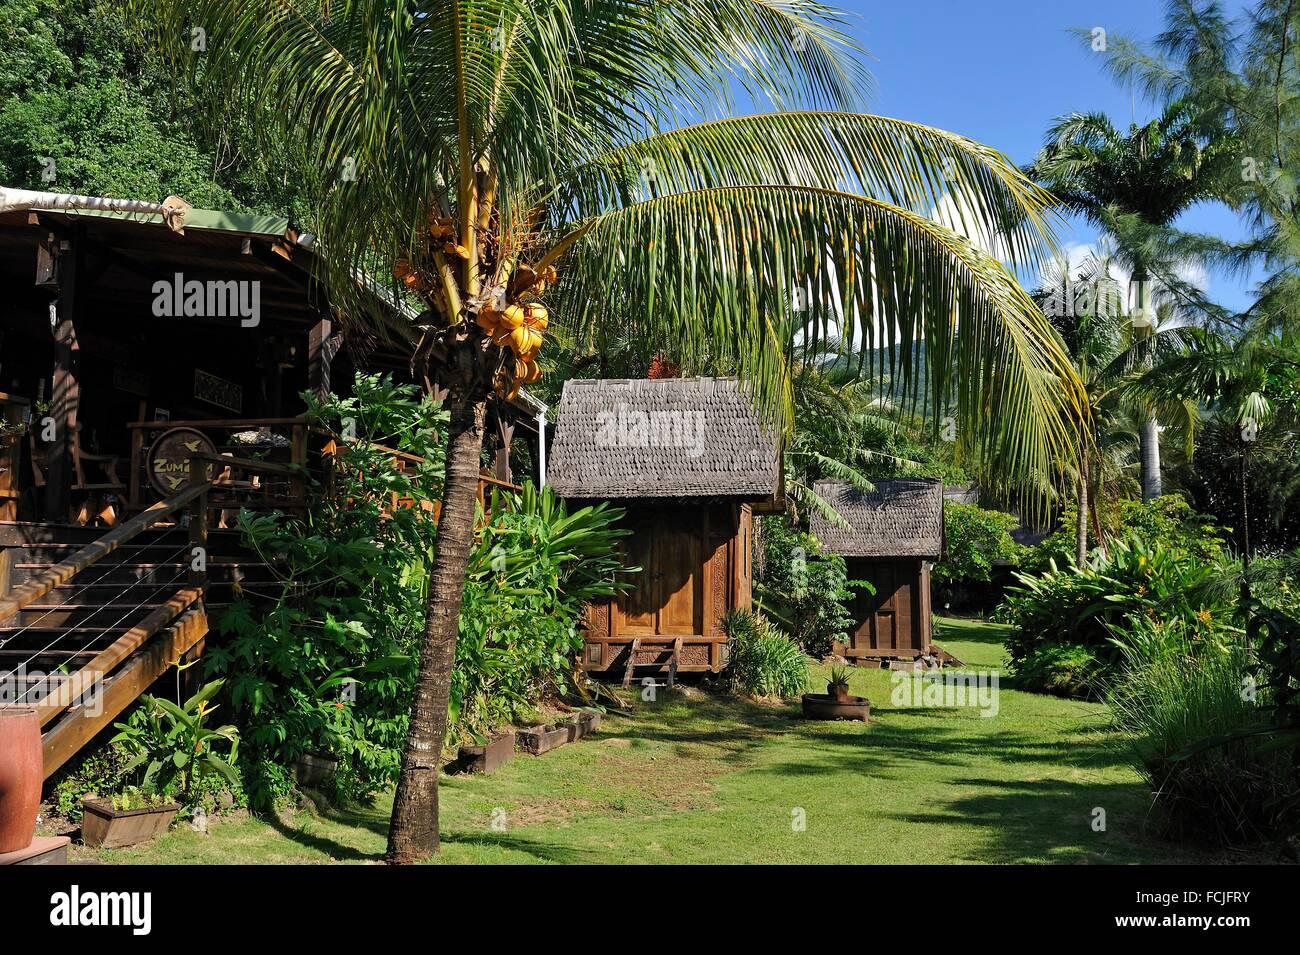 Tainos cottages charming hotel deshaies basse terre - Jardin botanique guadeloupe basse terre ...